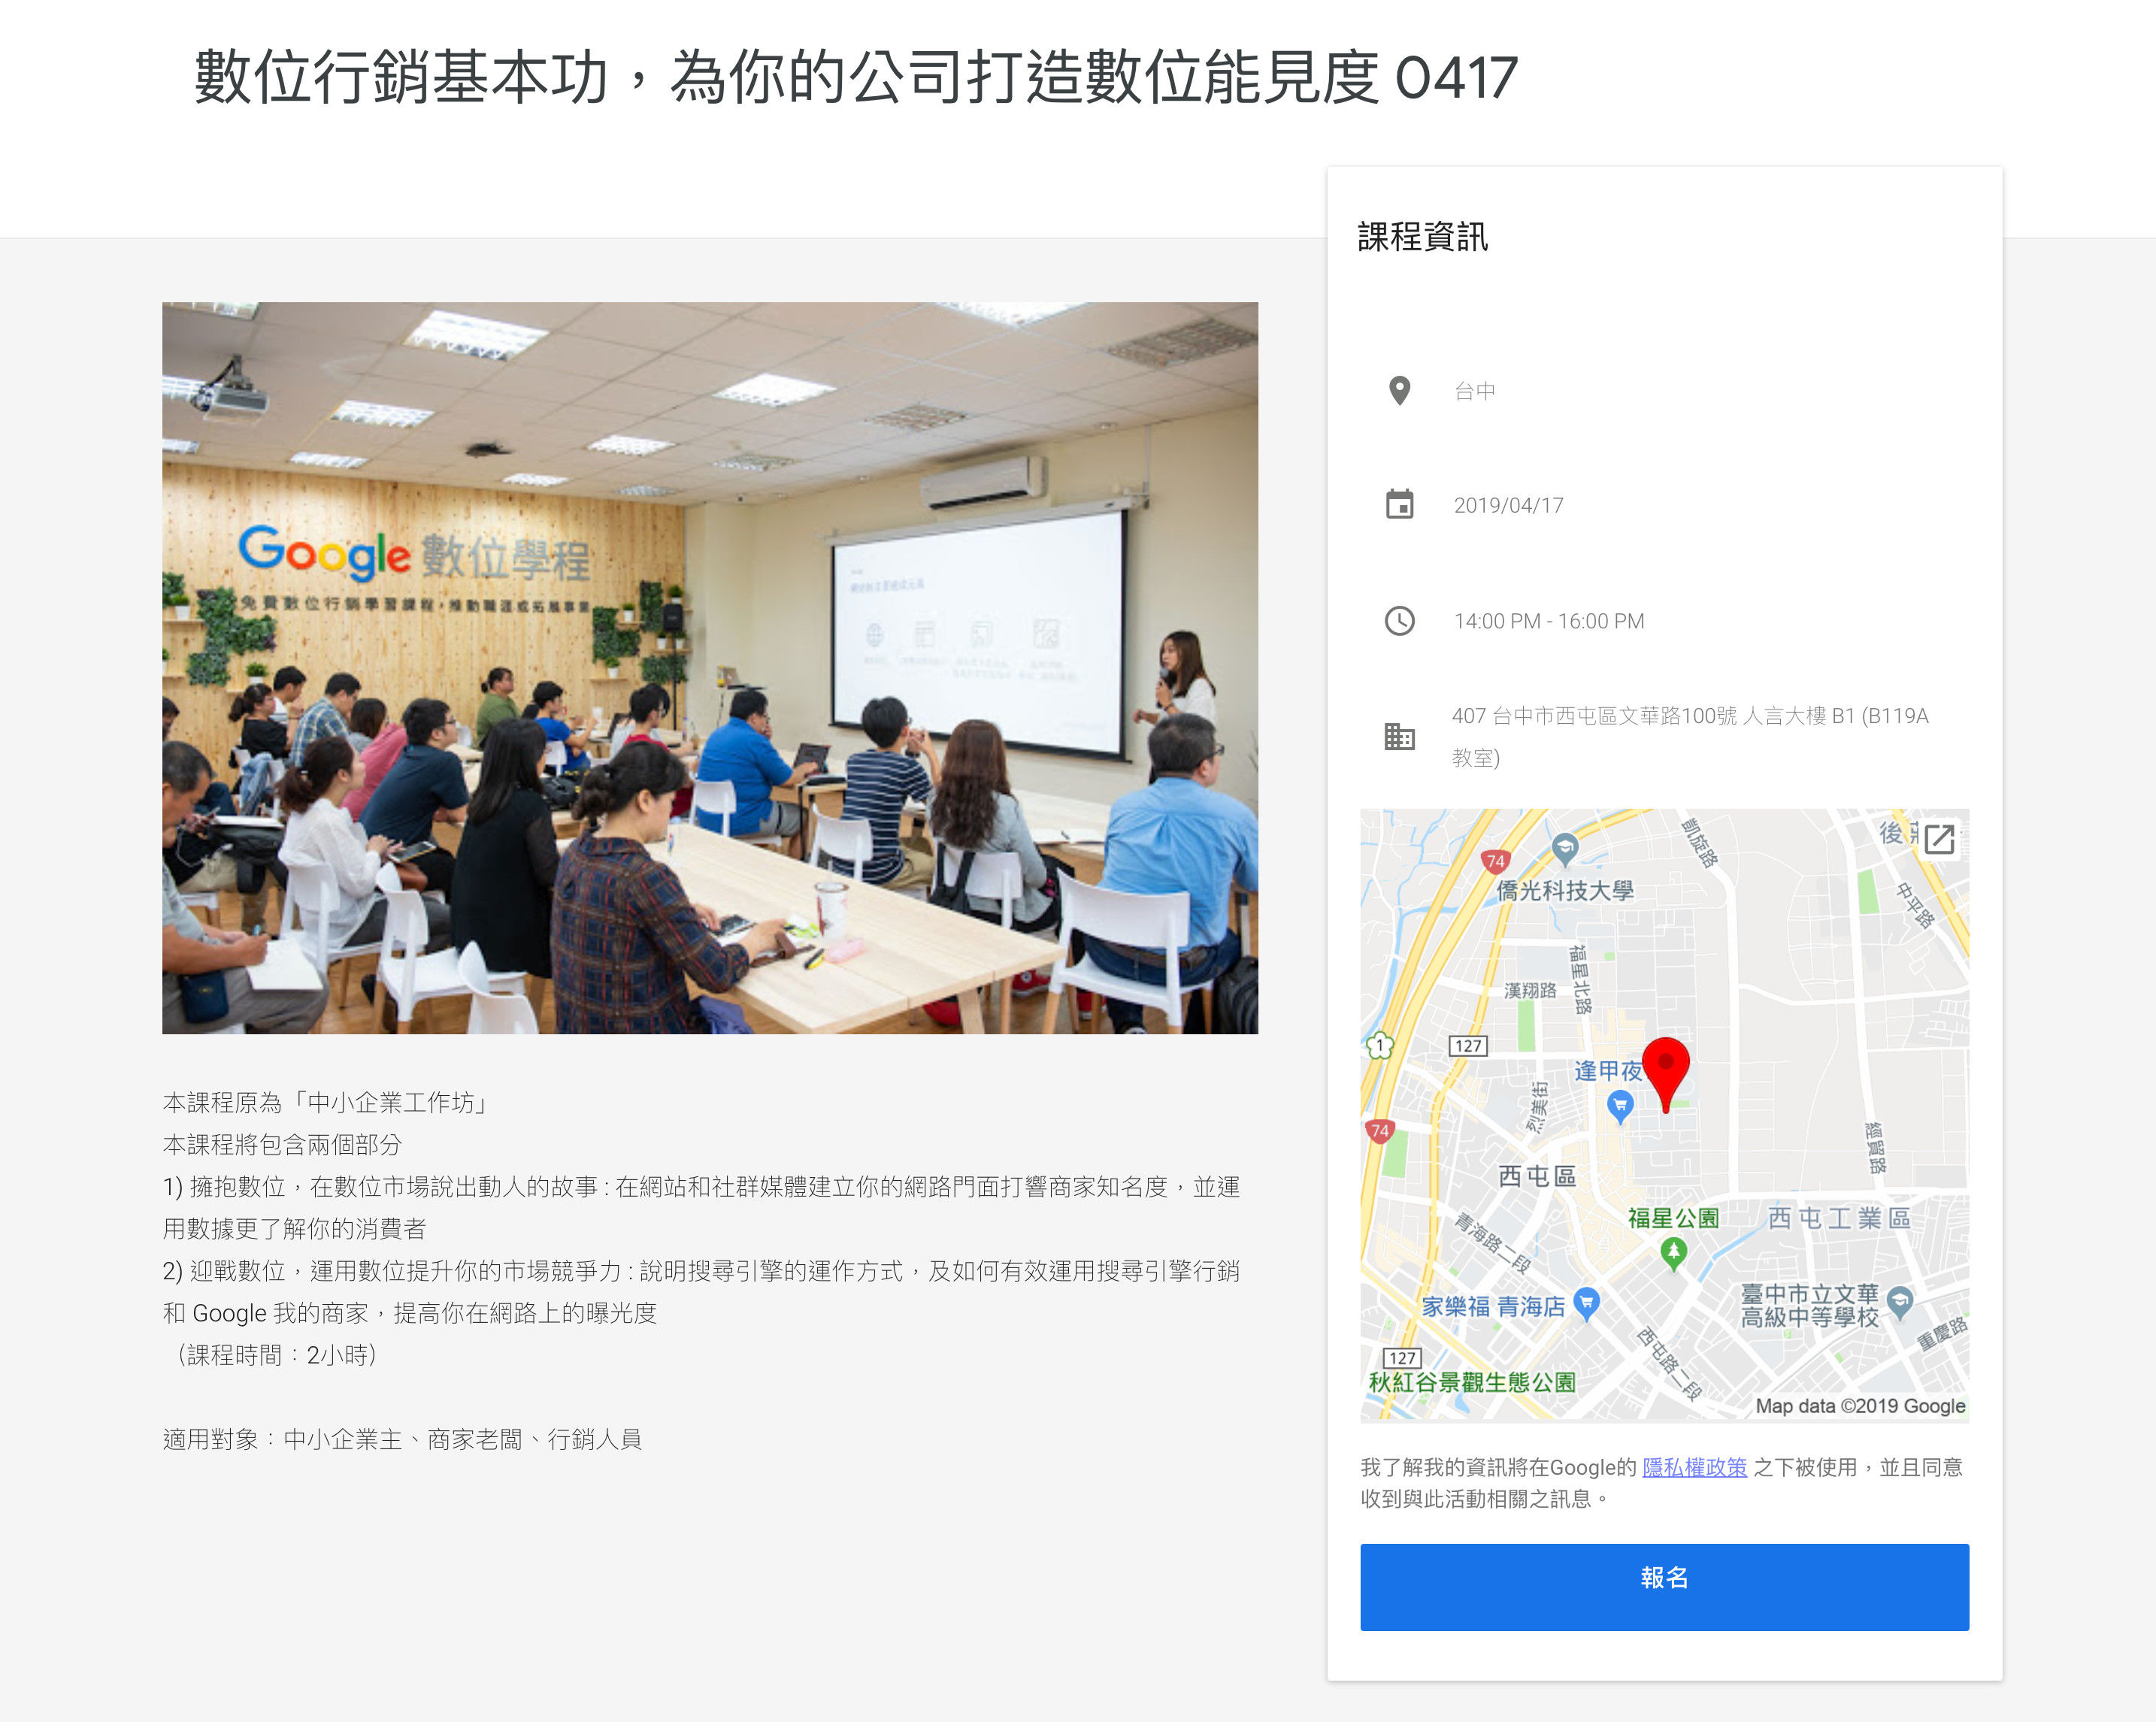 Google數位學程台中台南實體課程-鯊客科技SEO網頁設計公司